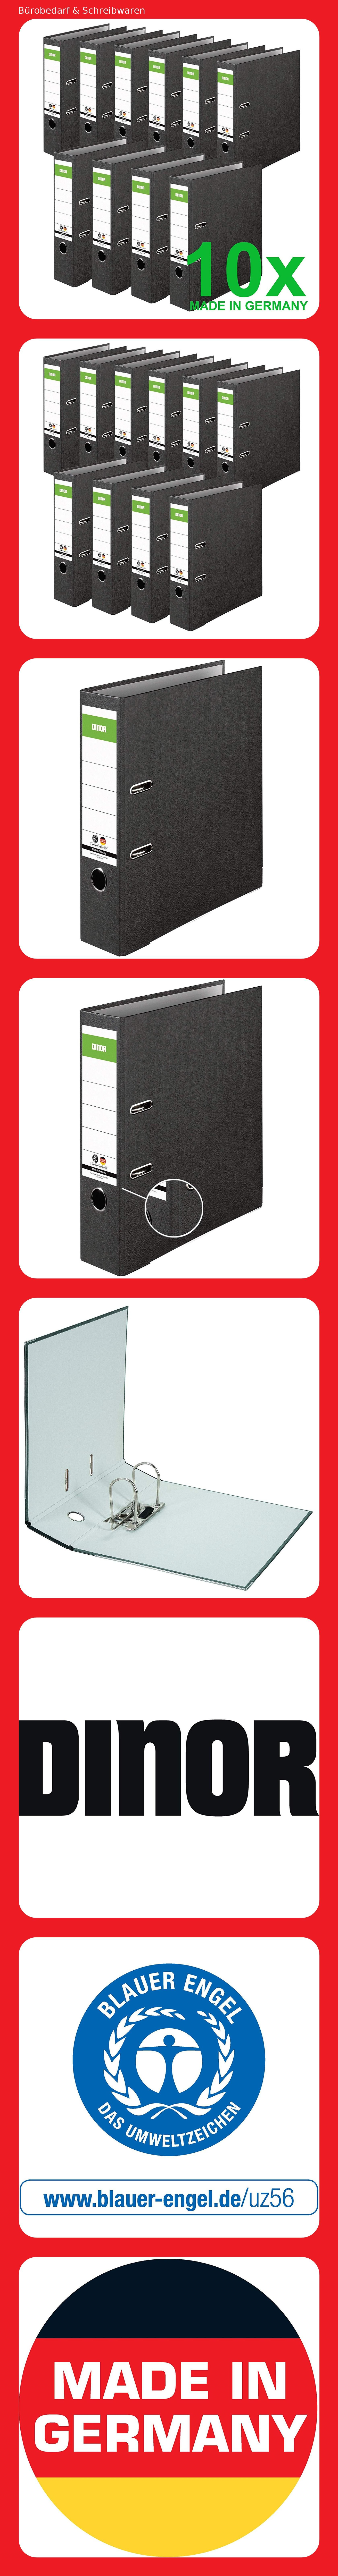 Grüner Balken Ordner-Wolkenmarmor Recycling 8 cm breit DIN A4 schwarz 10er Pack